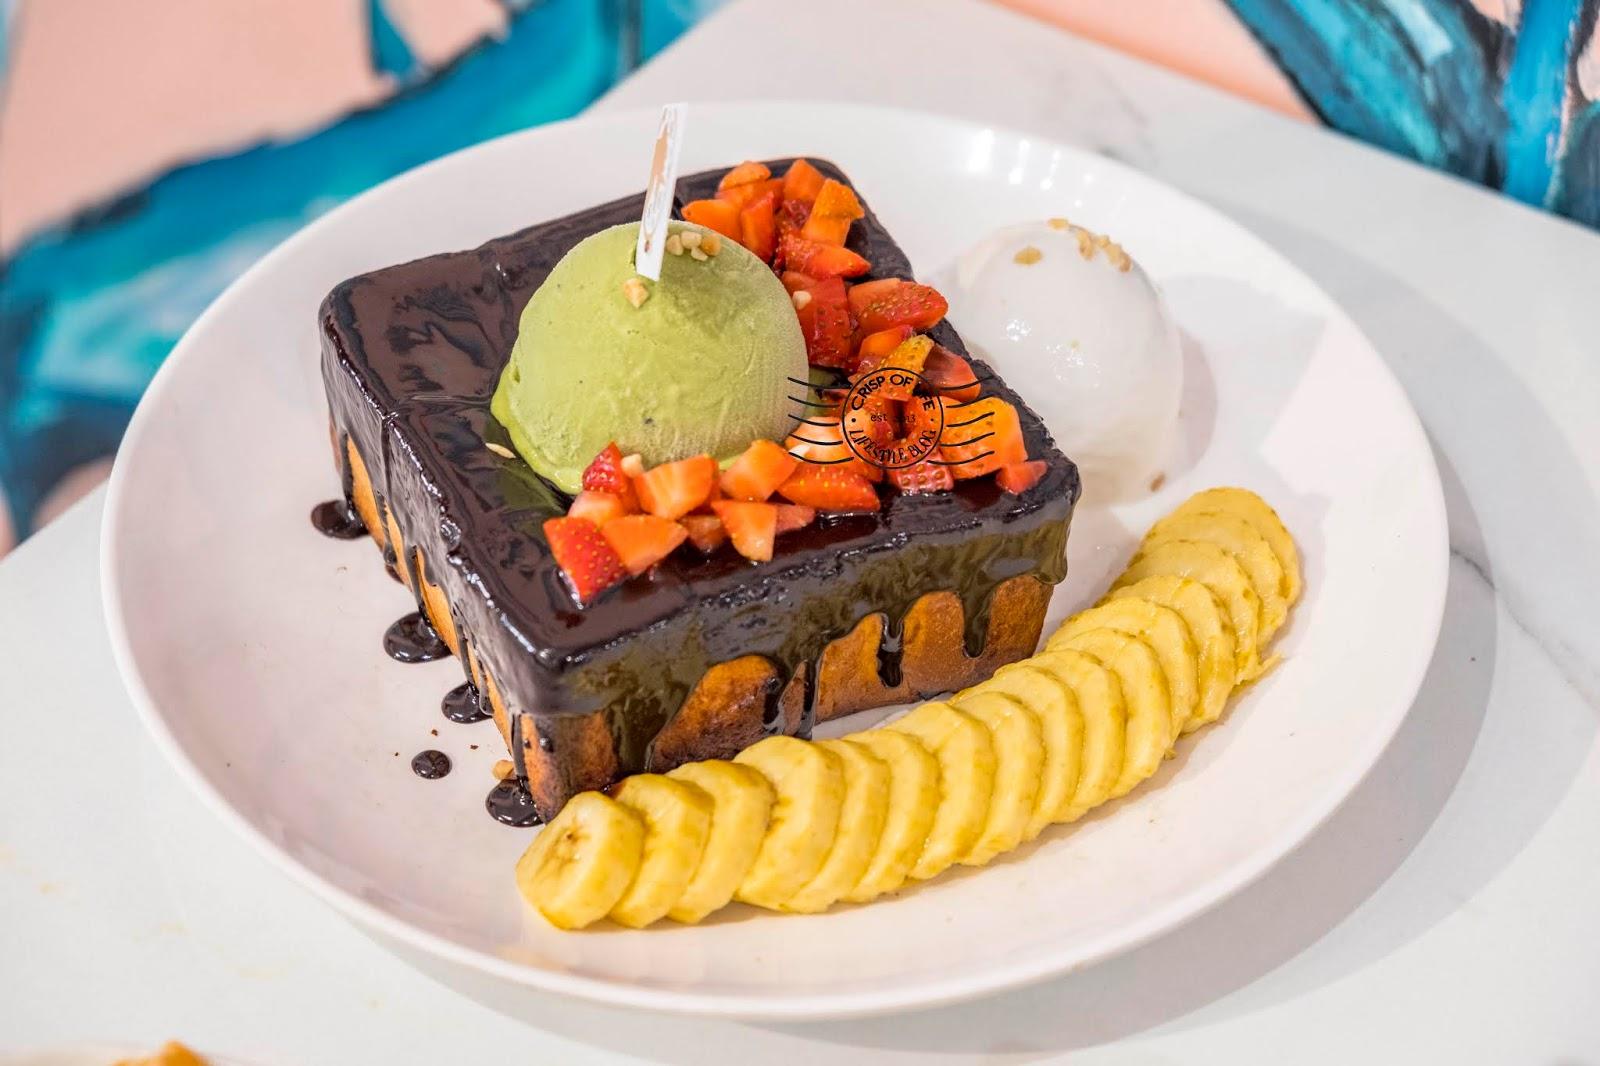 Mykori Dessert Cafe @ D'Piazza Mall, Penang